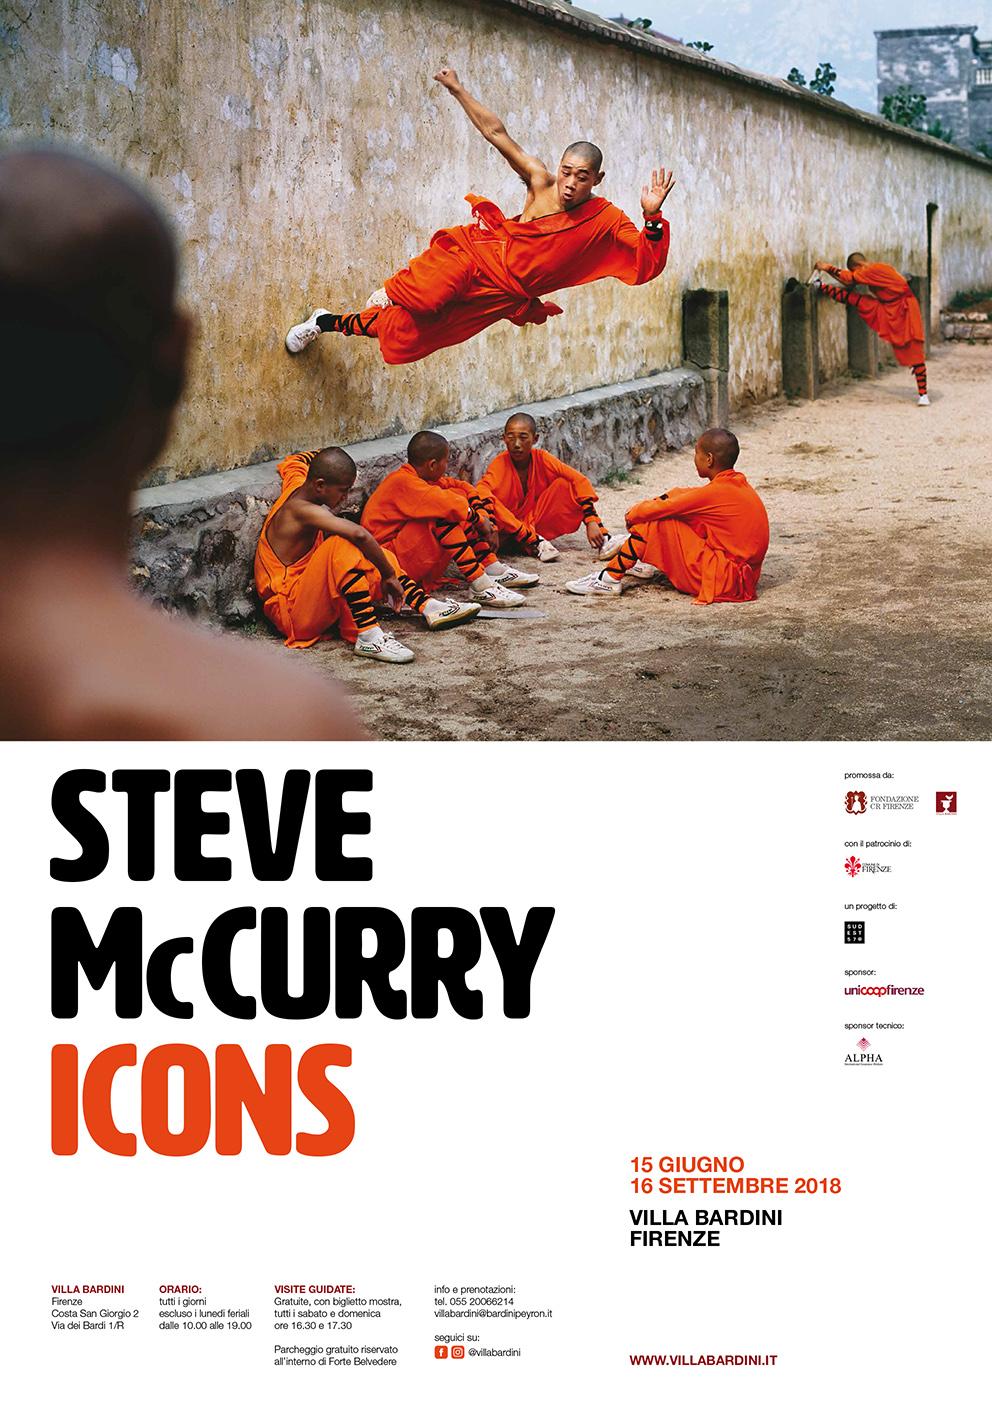 Steve McCurry Icons Firenze